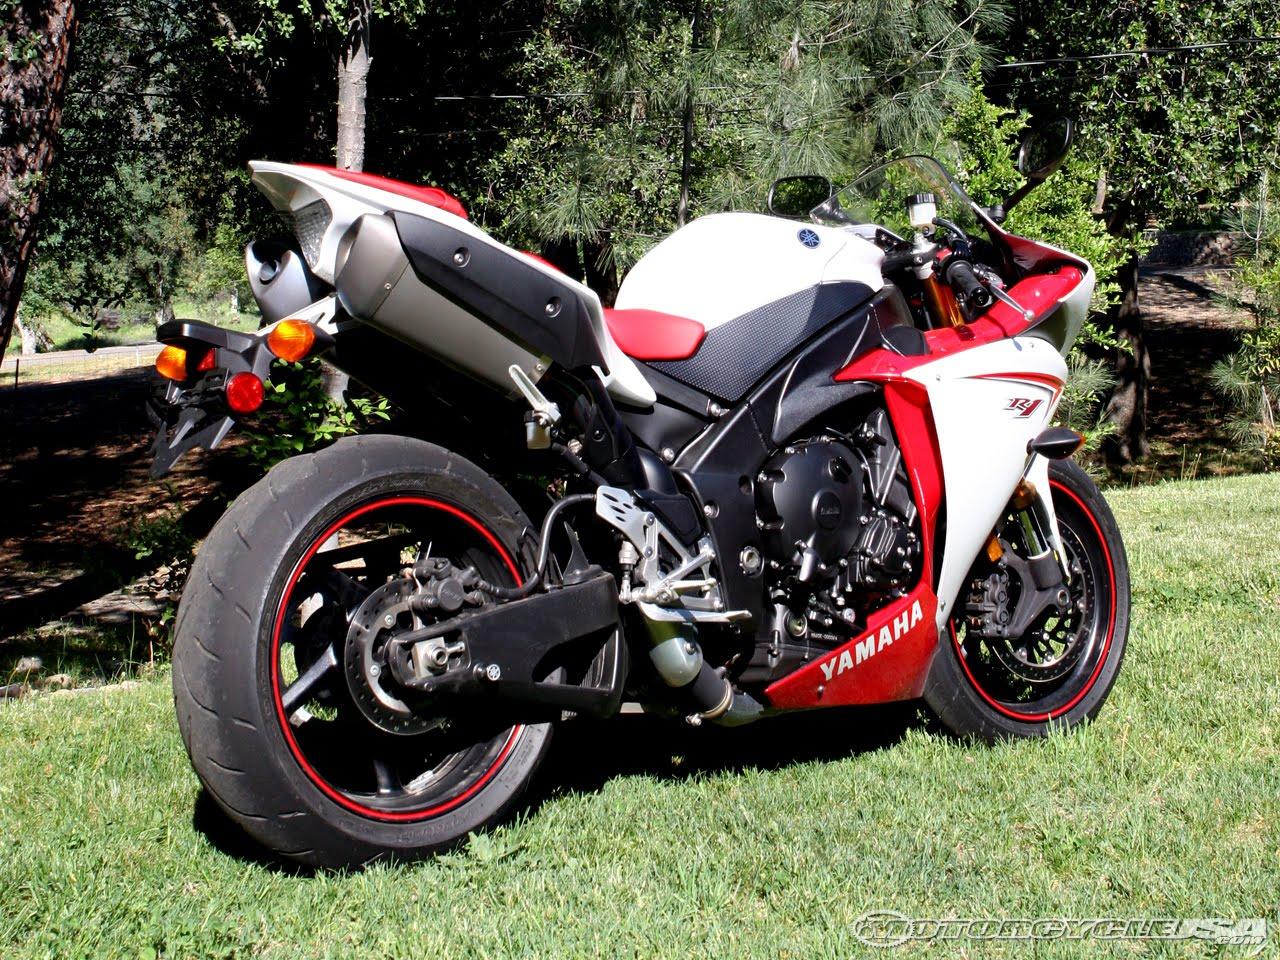 Yamaha R1 2009 Red